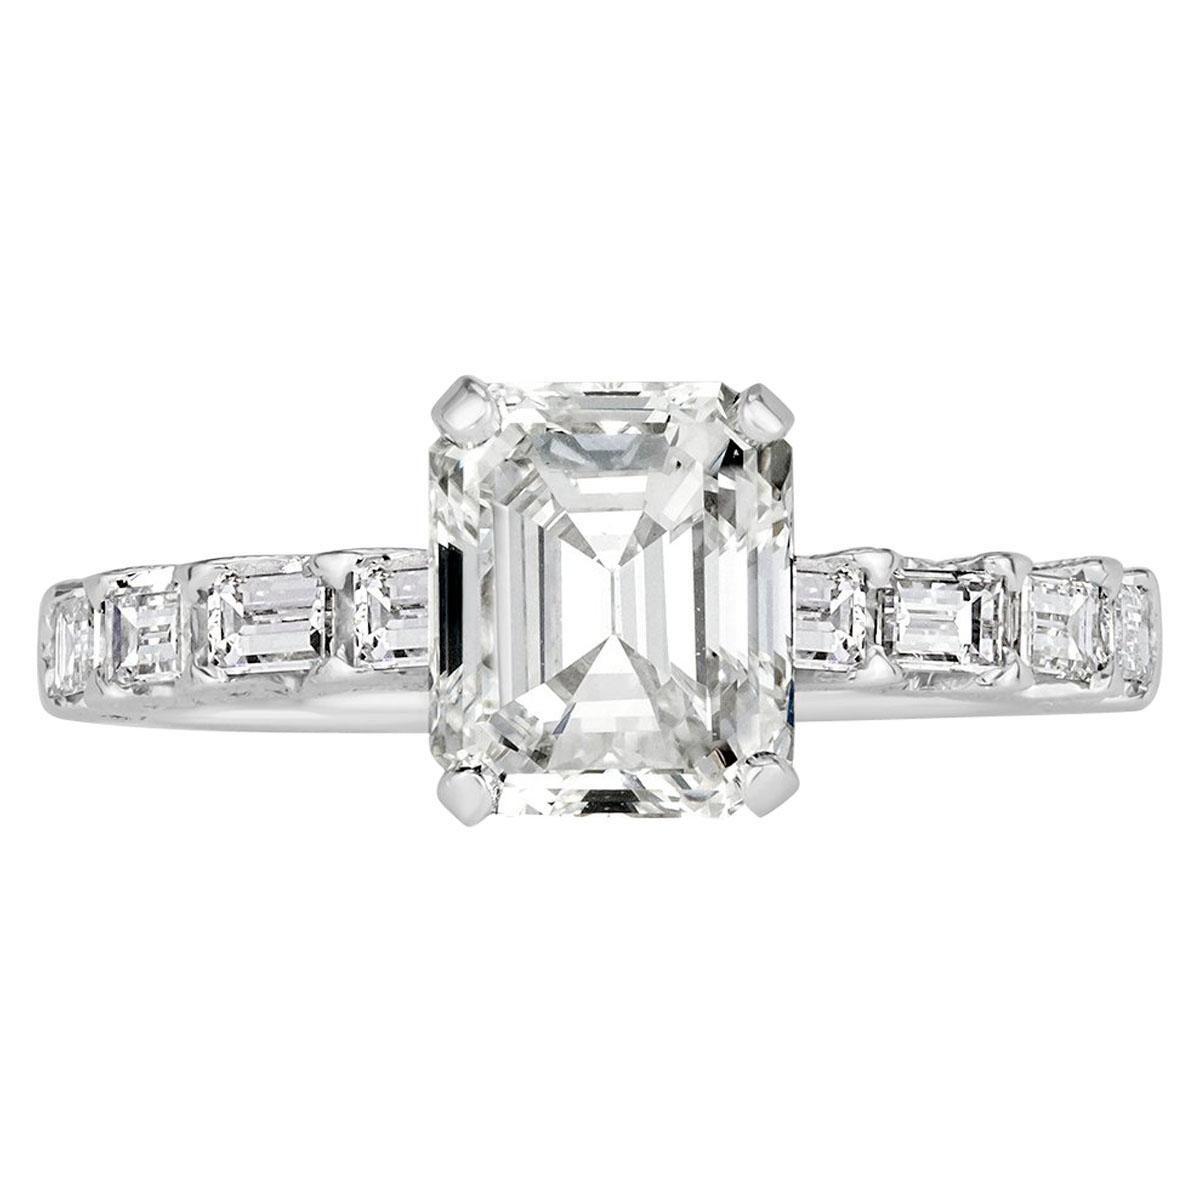 Mark Broumand 2.70 Carat Emerald Cut Diamond Engagement Ring